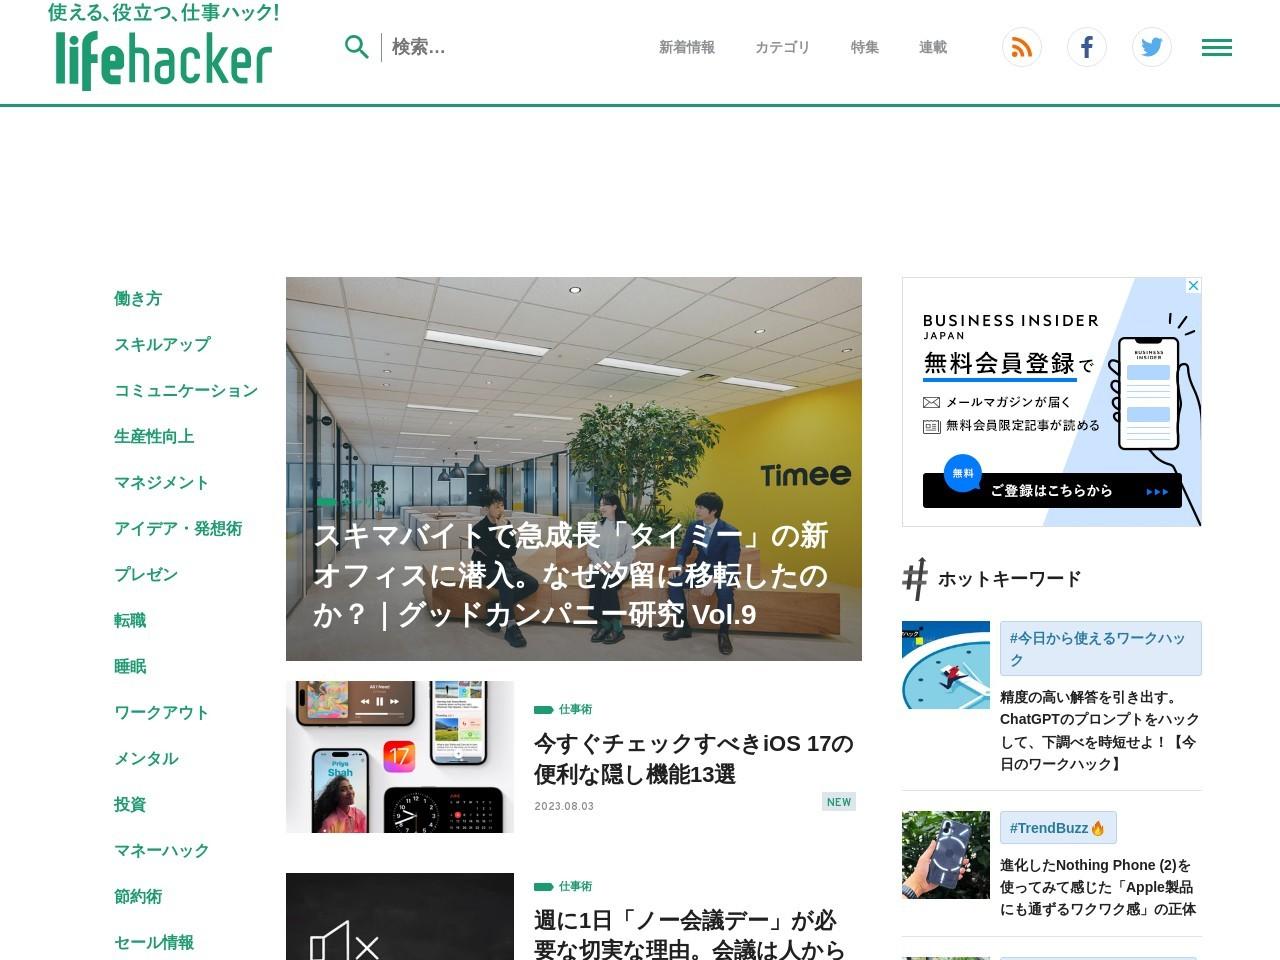 http://www.lifehacker.jp/2013/03/130306am-i-responsive.html